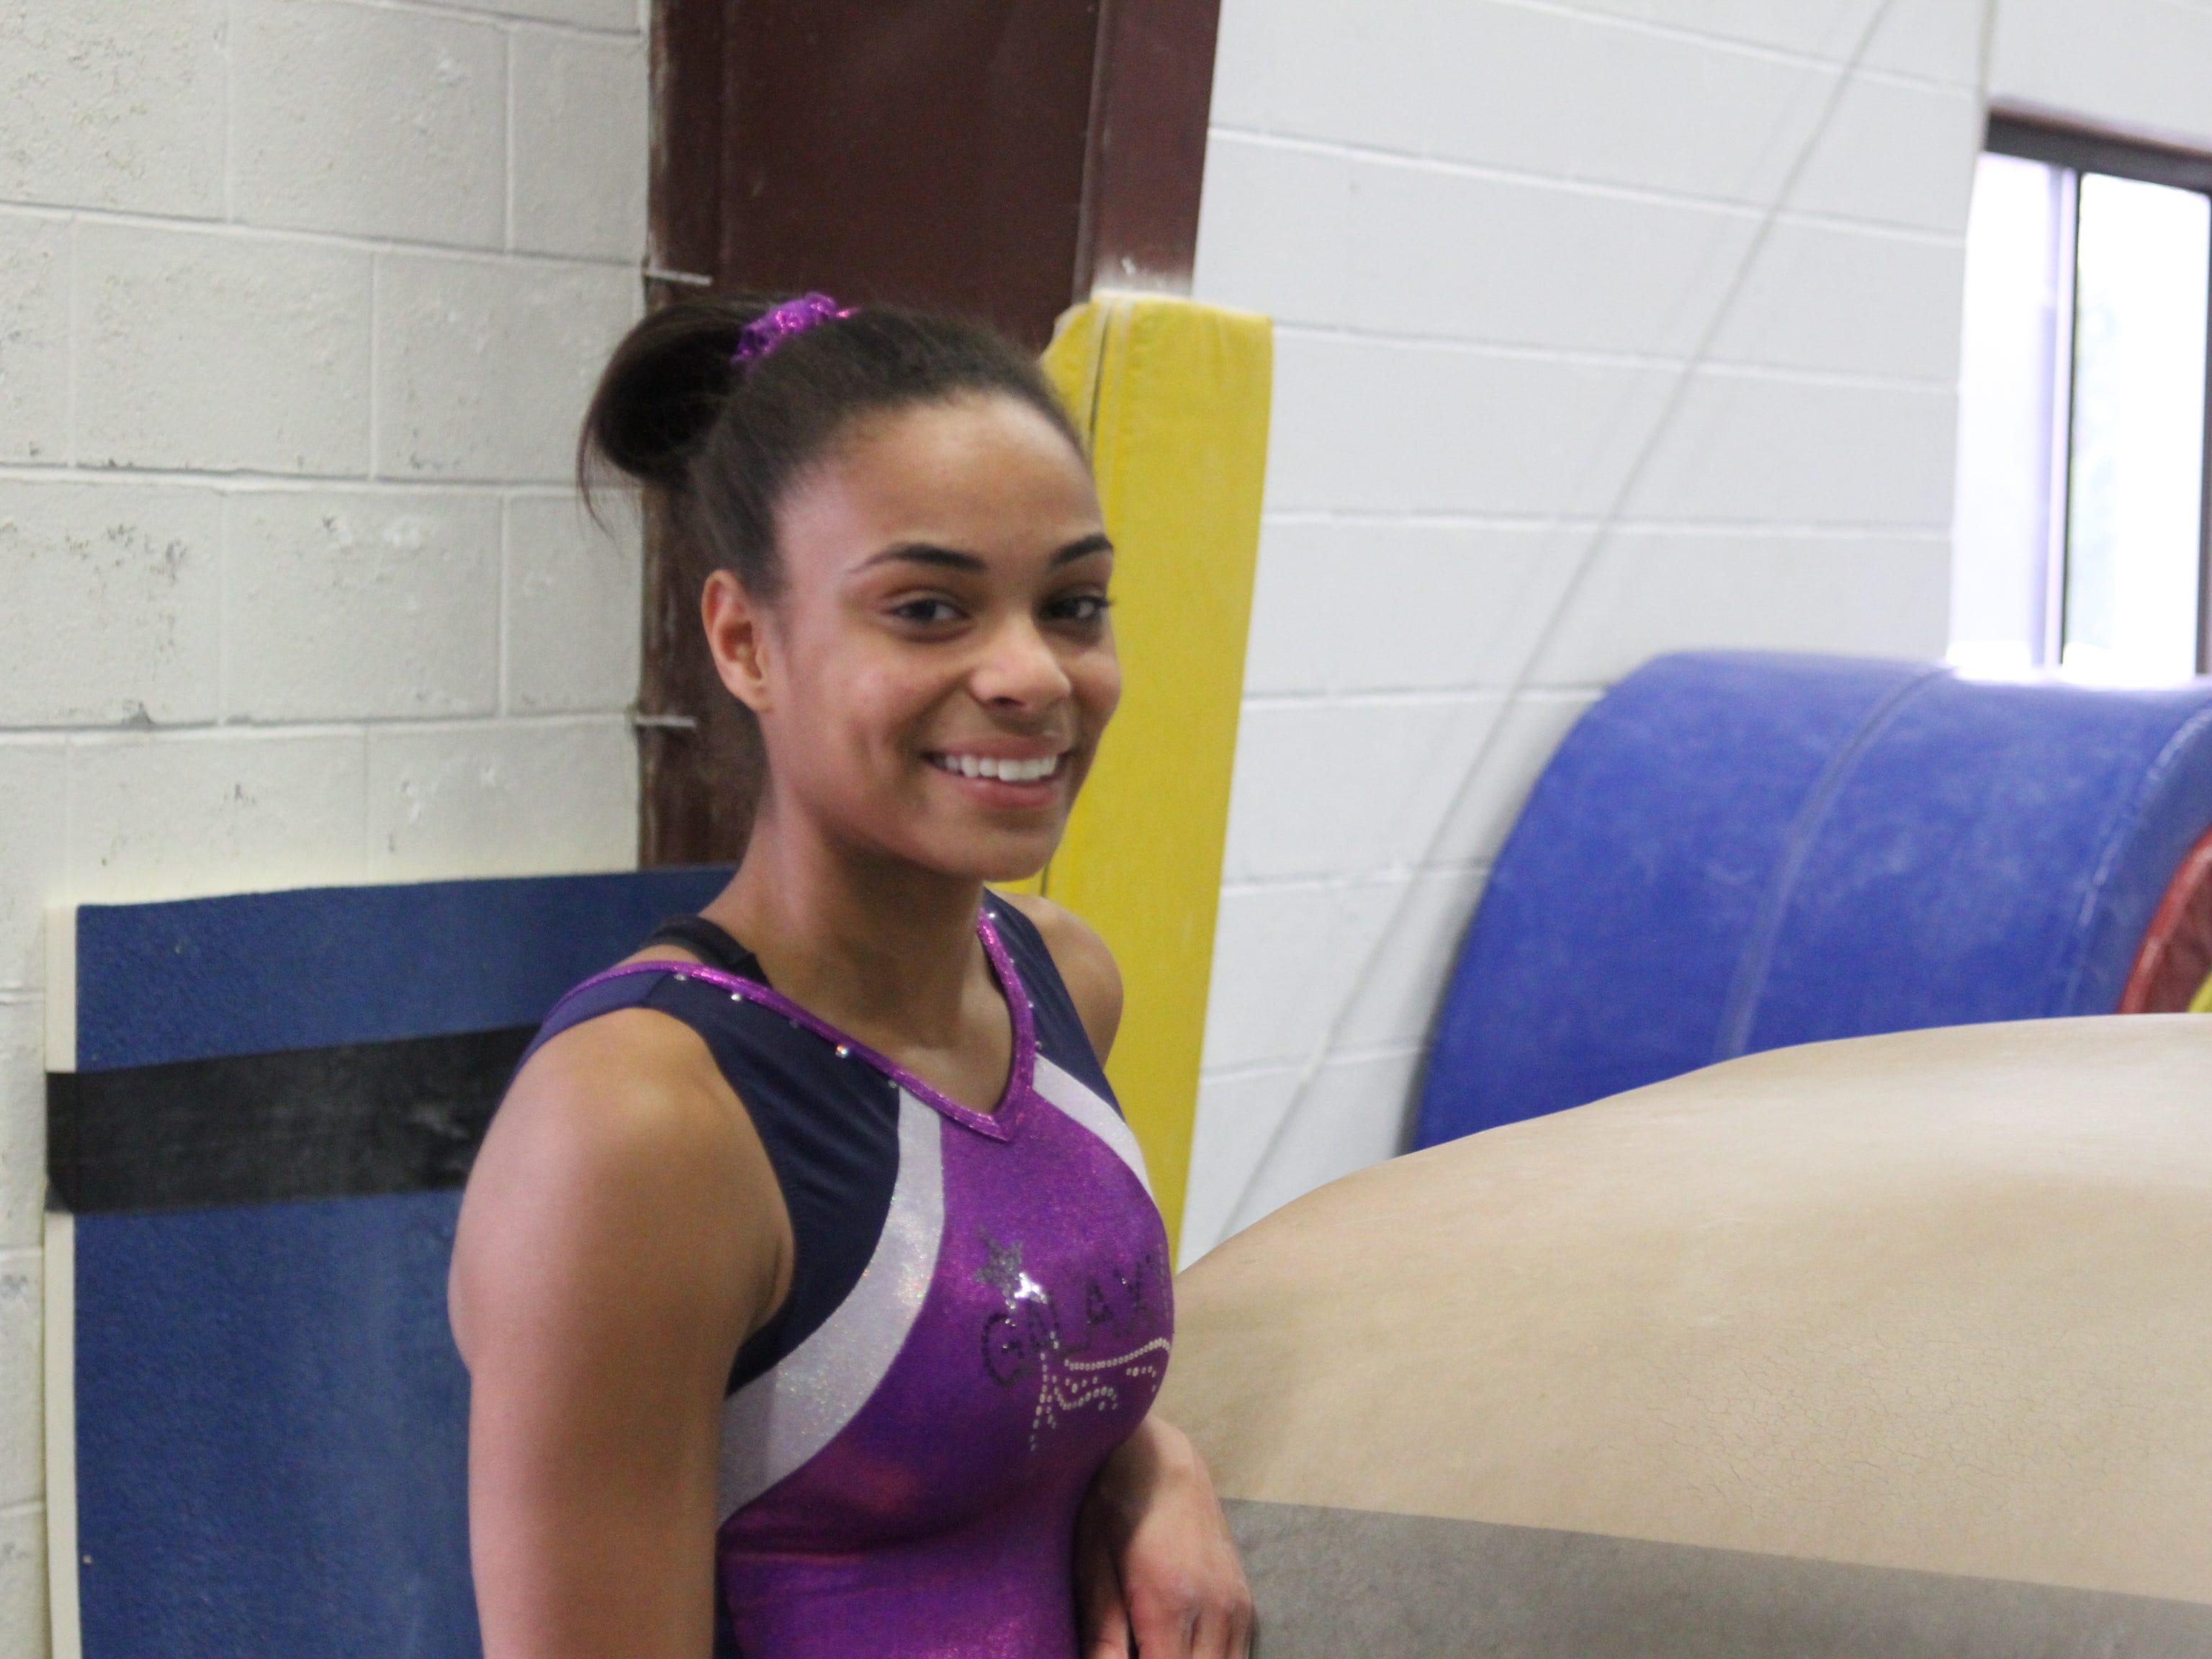 Nyack freshman gymnast Amara Cunningham is the 2015 Journal News Gymnast of the Year.